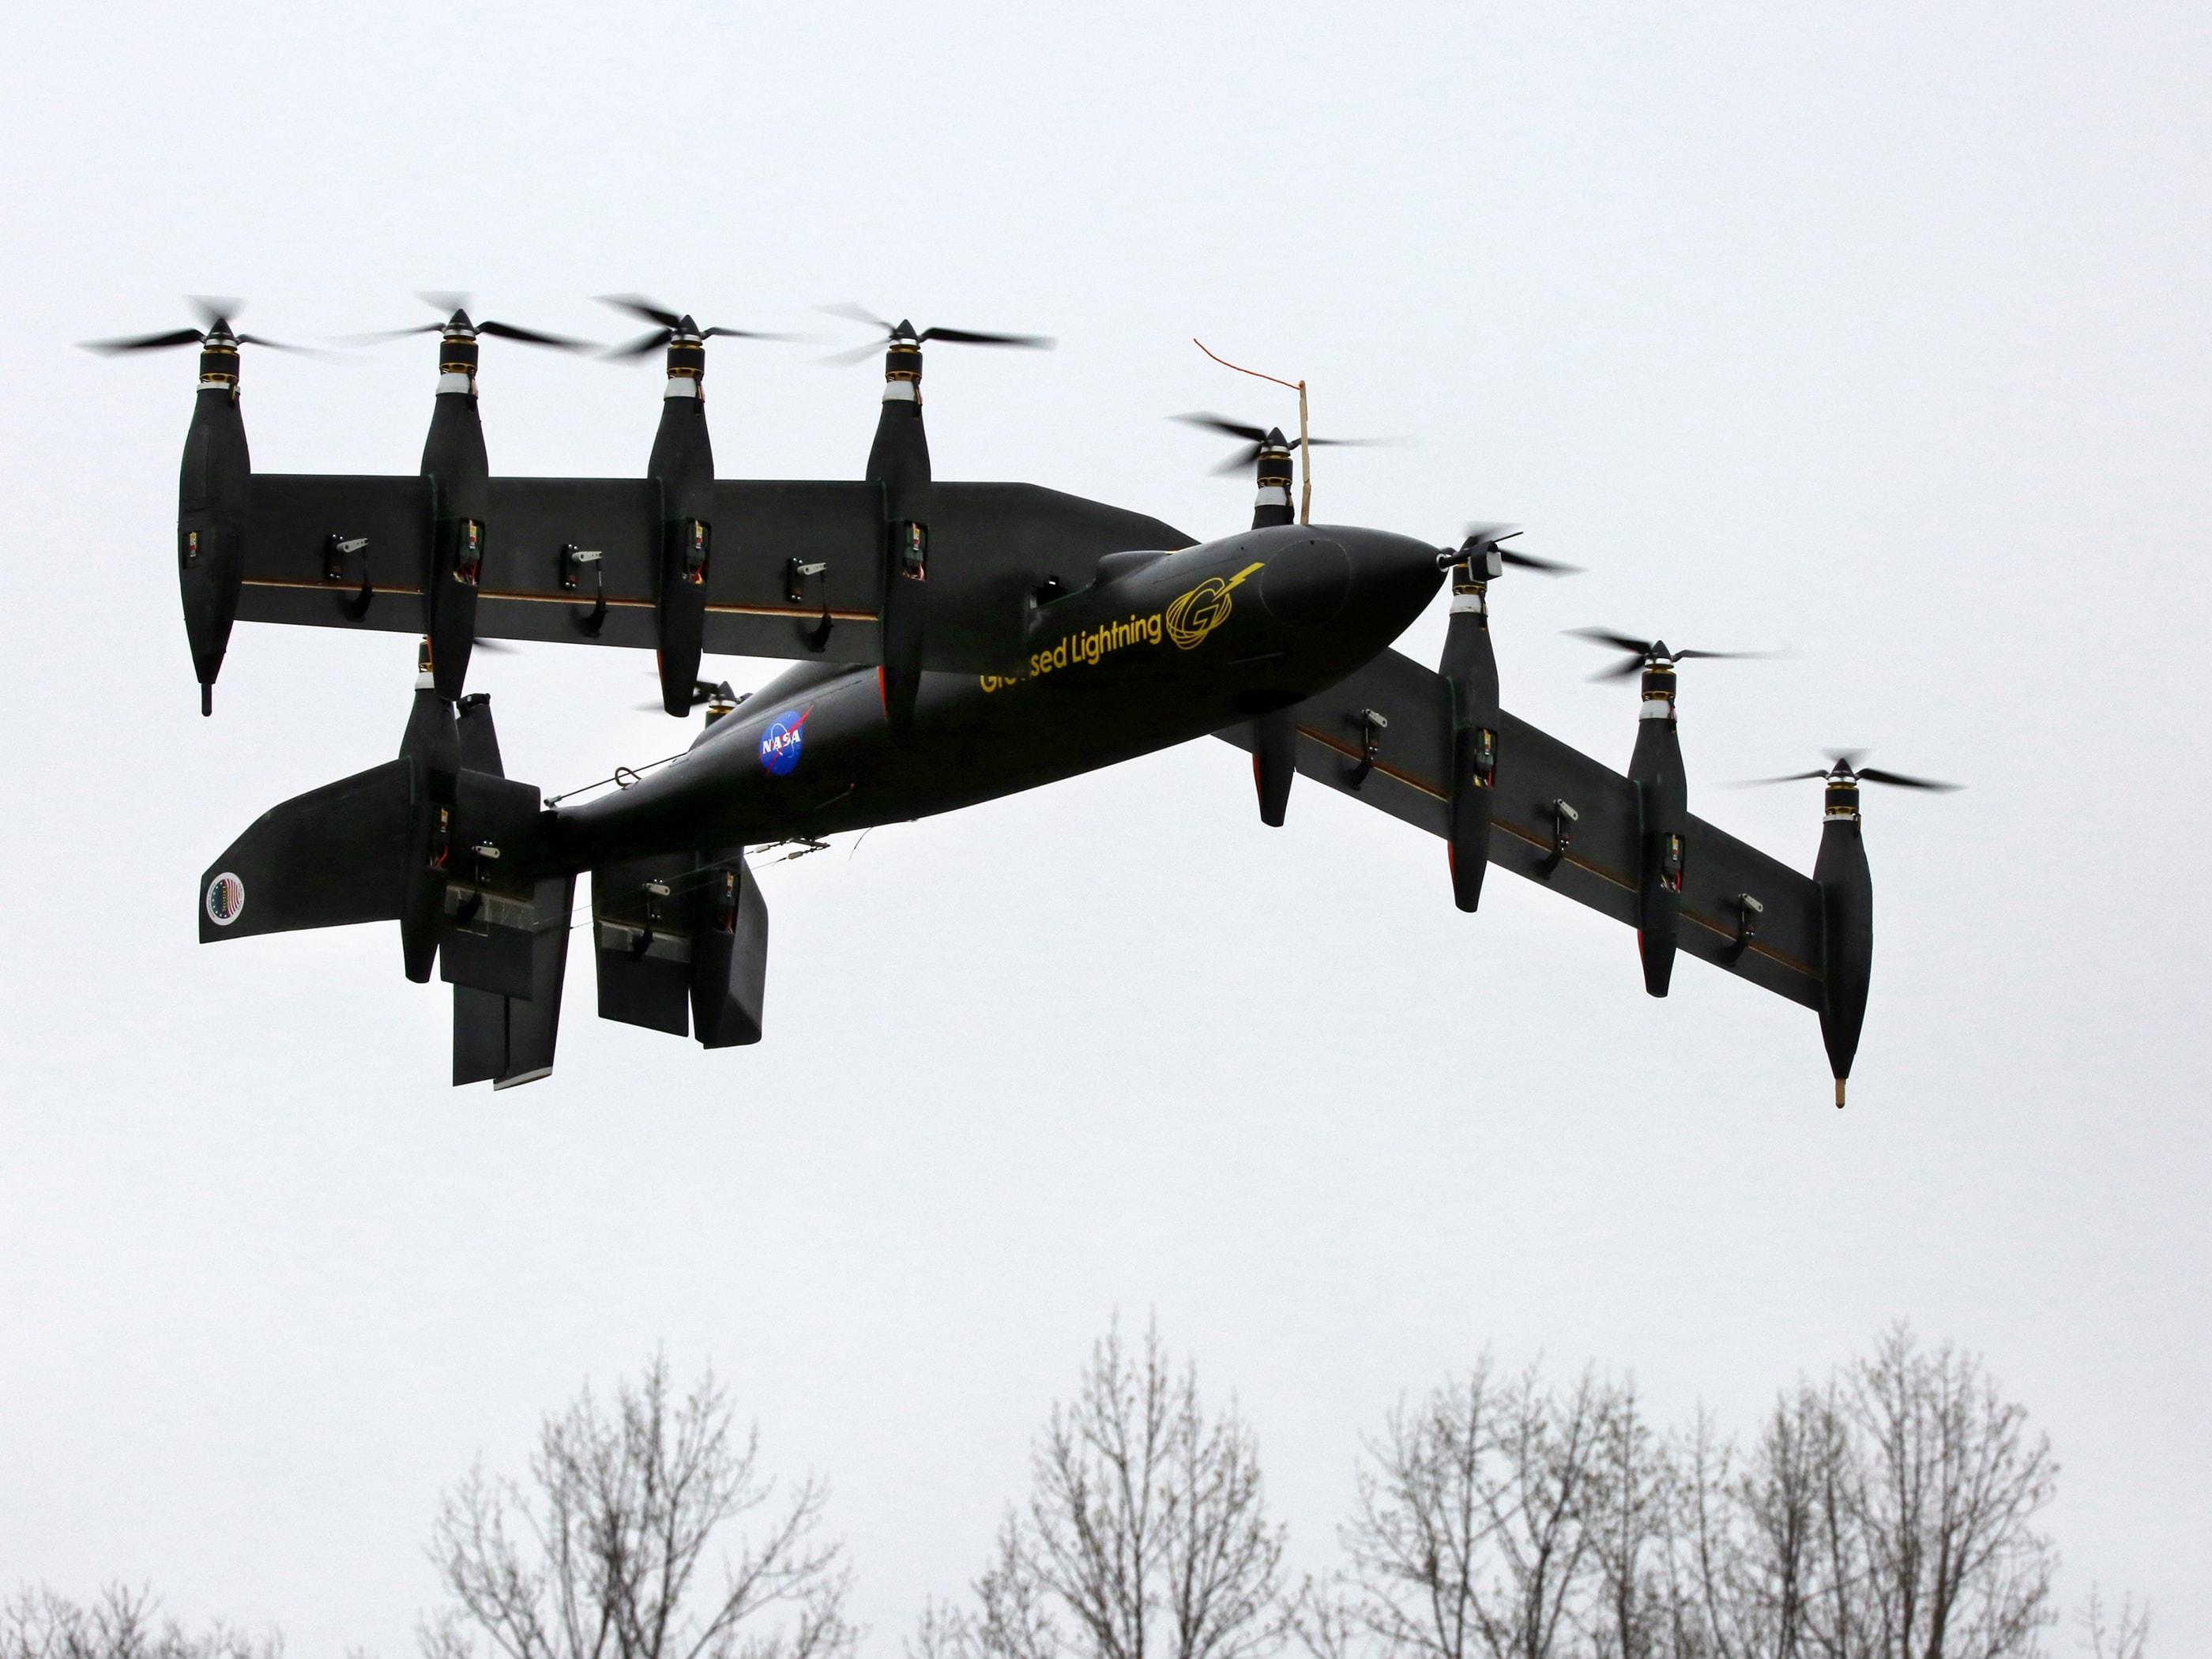 Aerei Da Caccia A Decollo Verticale : La nasa testa greased lightning un aereo a decollo